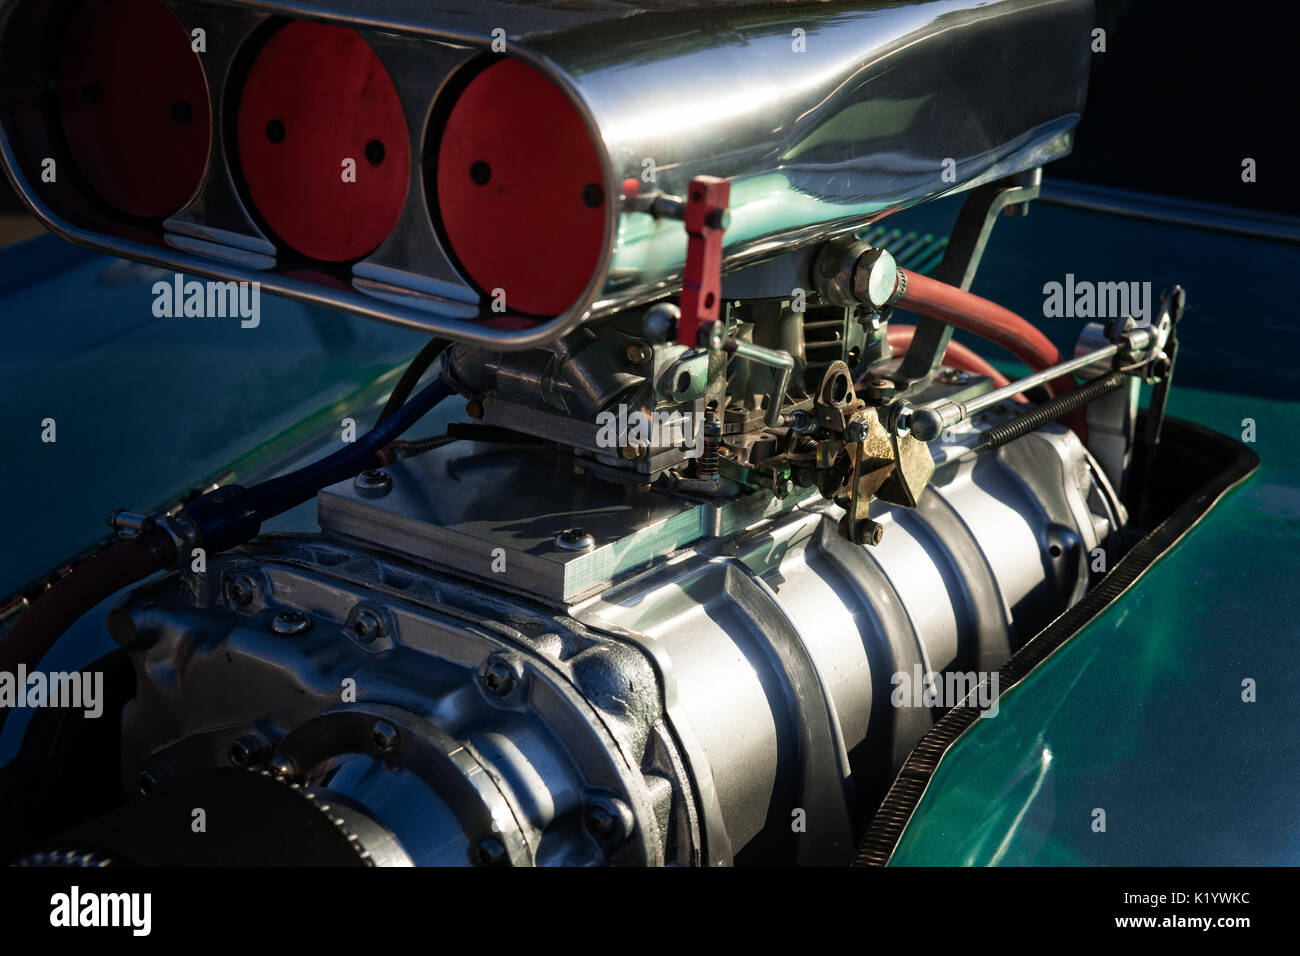 Supercharged Engine Stockfotos & Supercharged Engine Bilder - Alamy